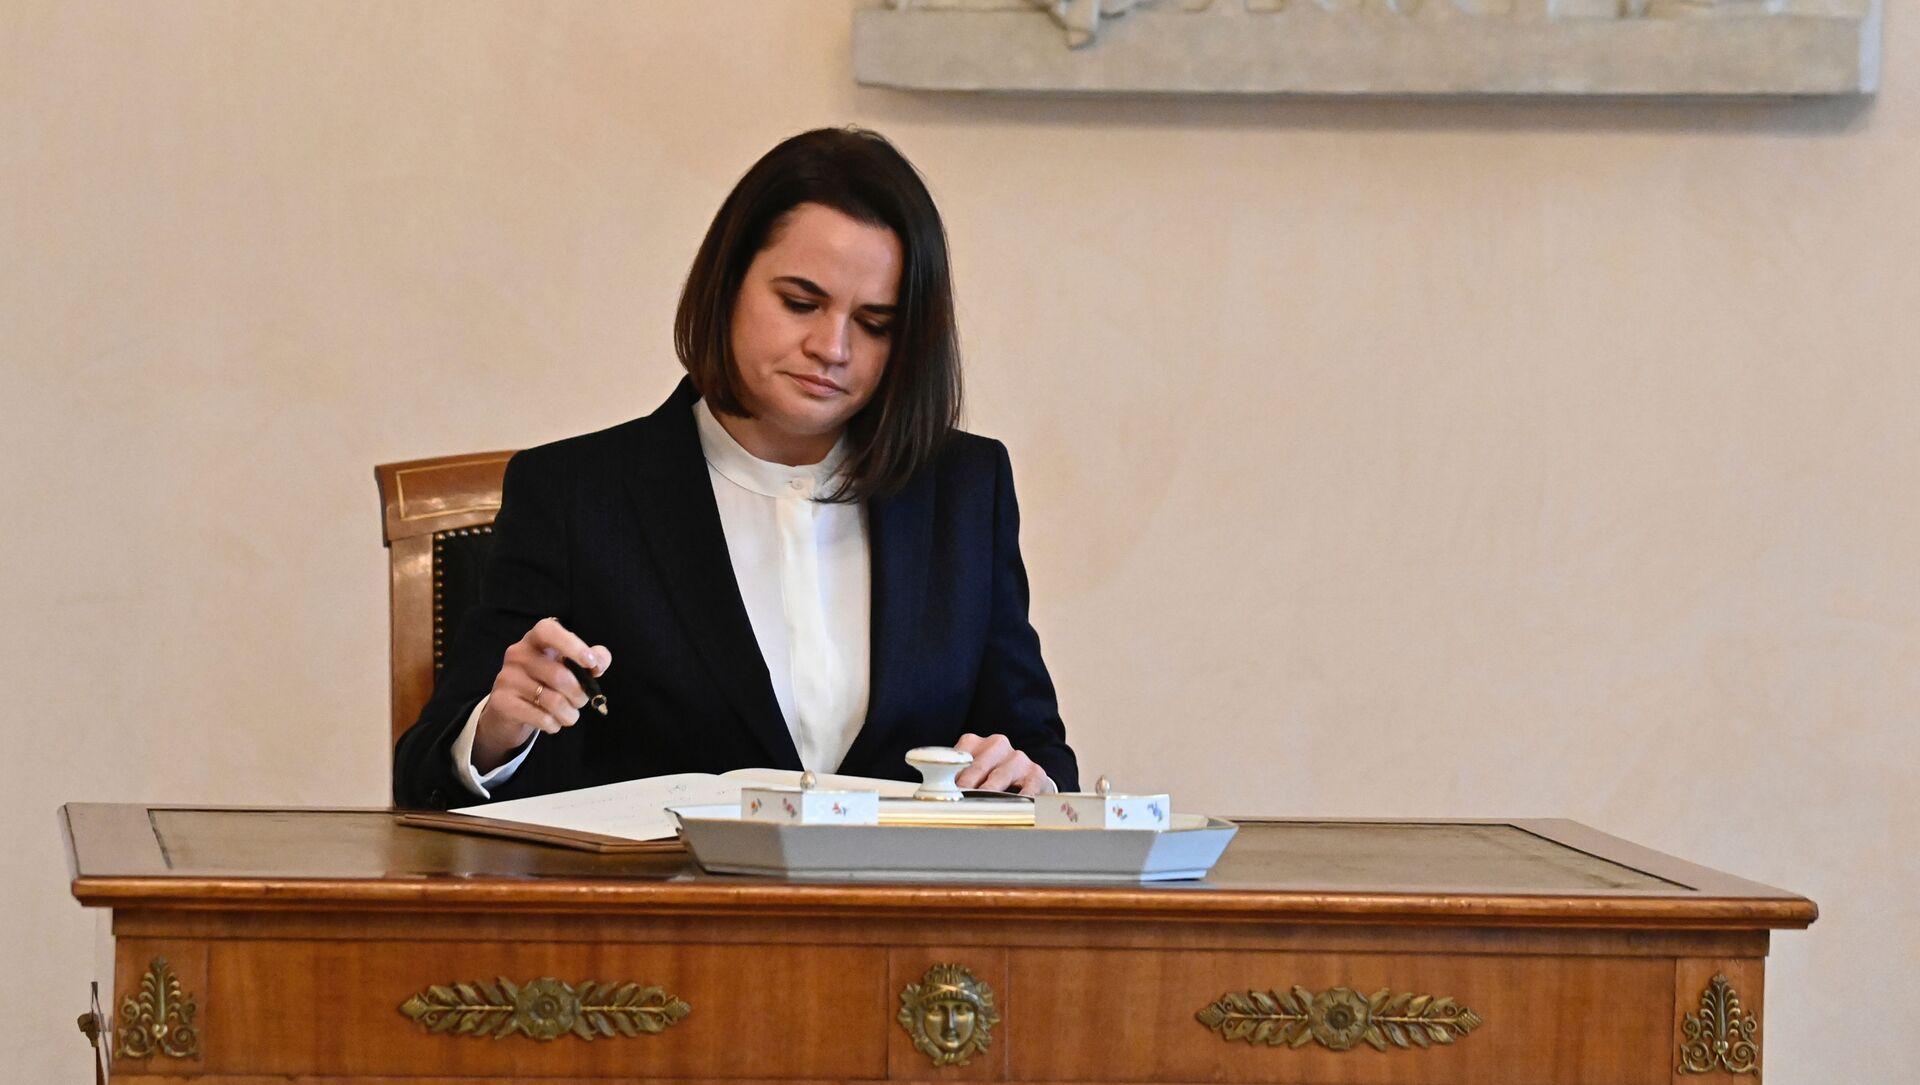 L'oppositrice bielorussa ed ex candidata alla presidenza Svetlana Tikhanovskaya - Sputnik Italia, 1920, 10.02.2021